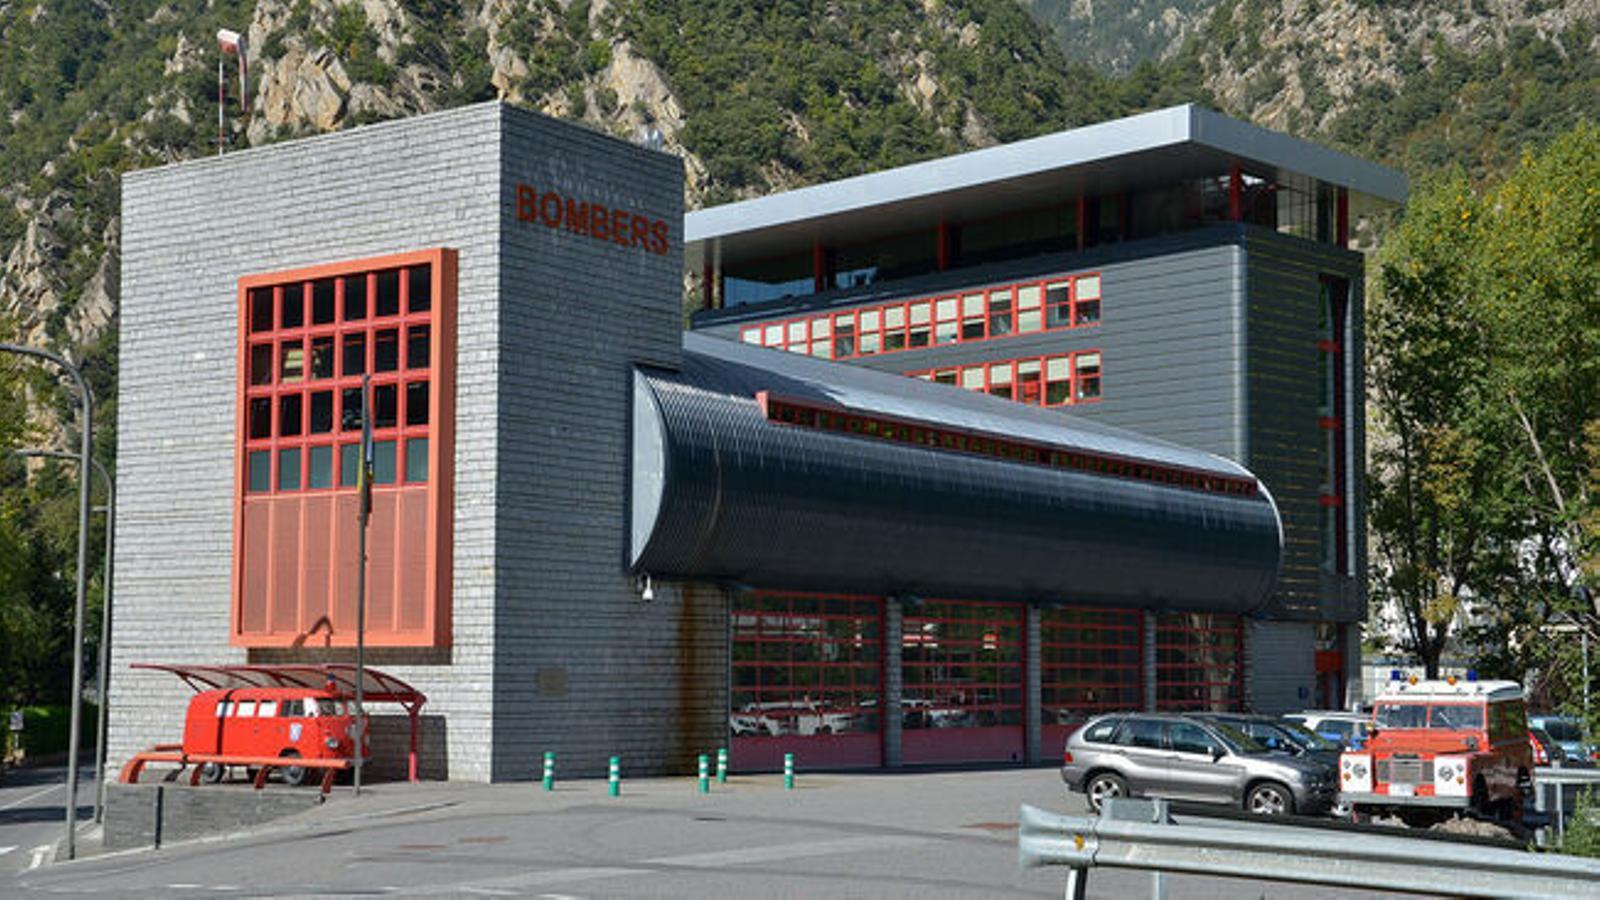 La caserna dels bombers de Santa Coloma. / ARXIU ANA